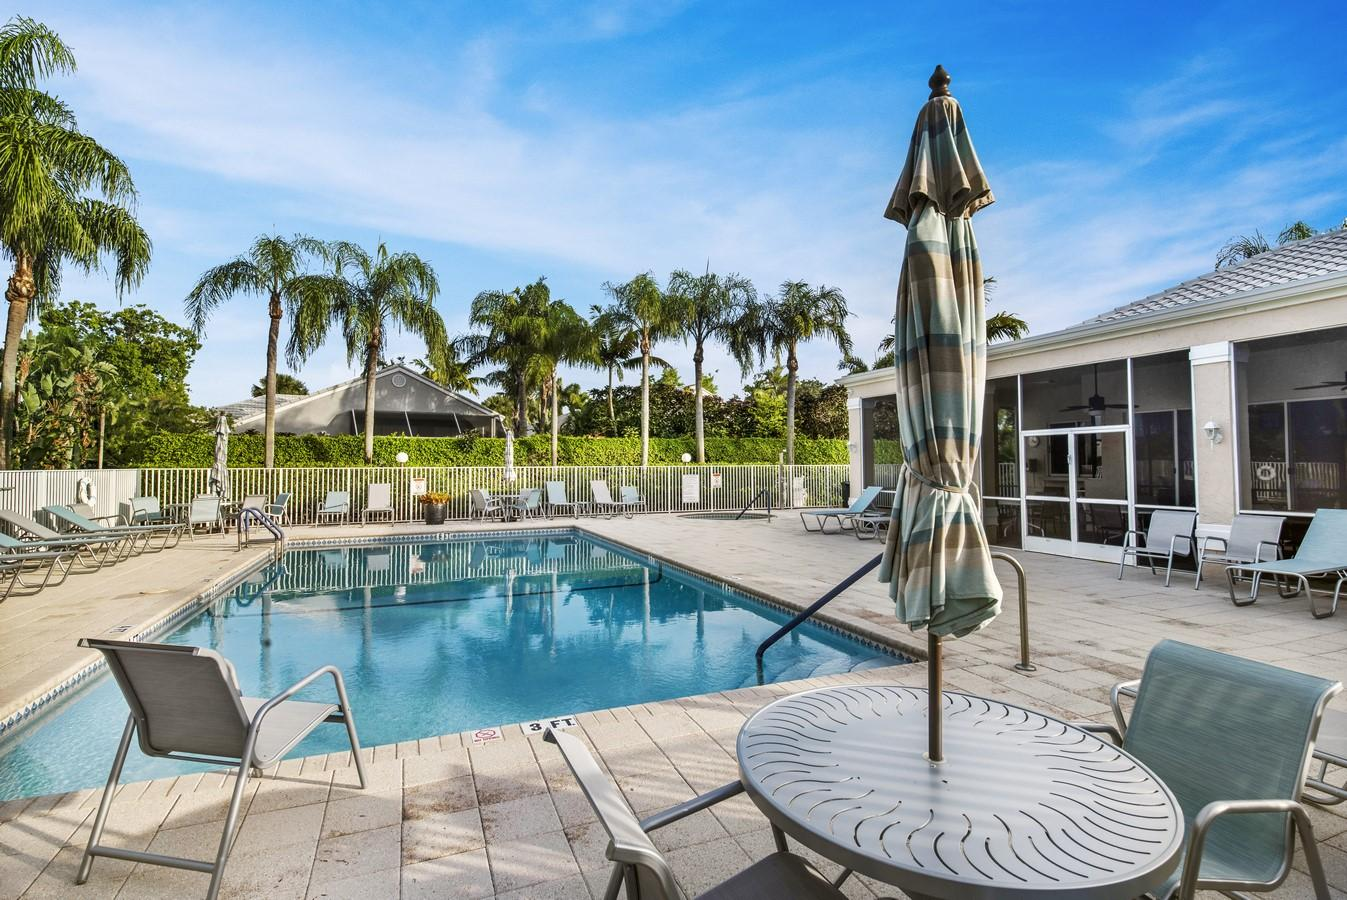 11817 Fountainside Circle Boynton Beach, FL 33437 photo 52